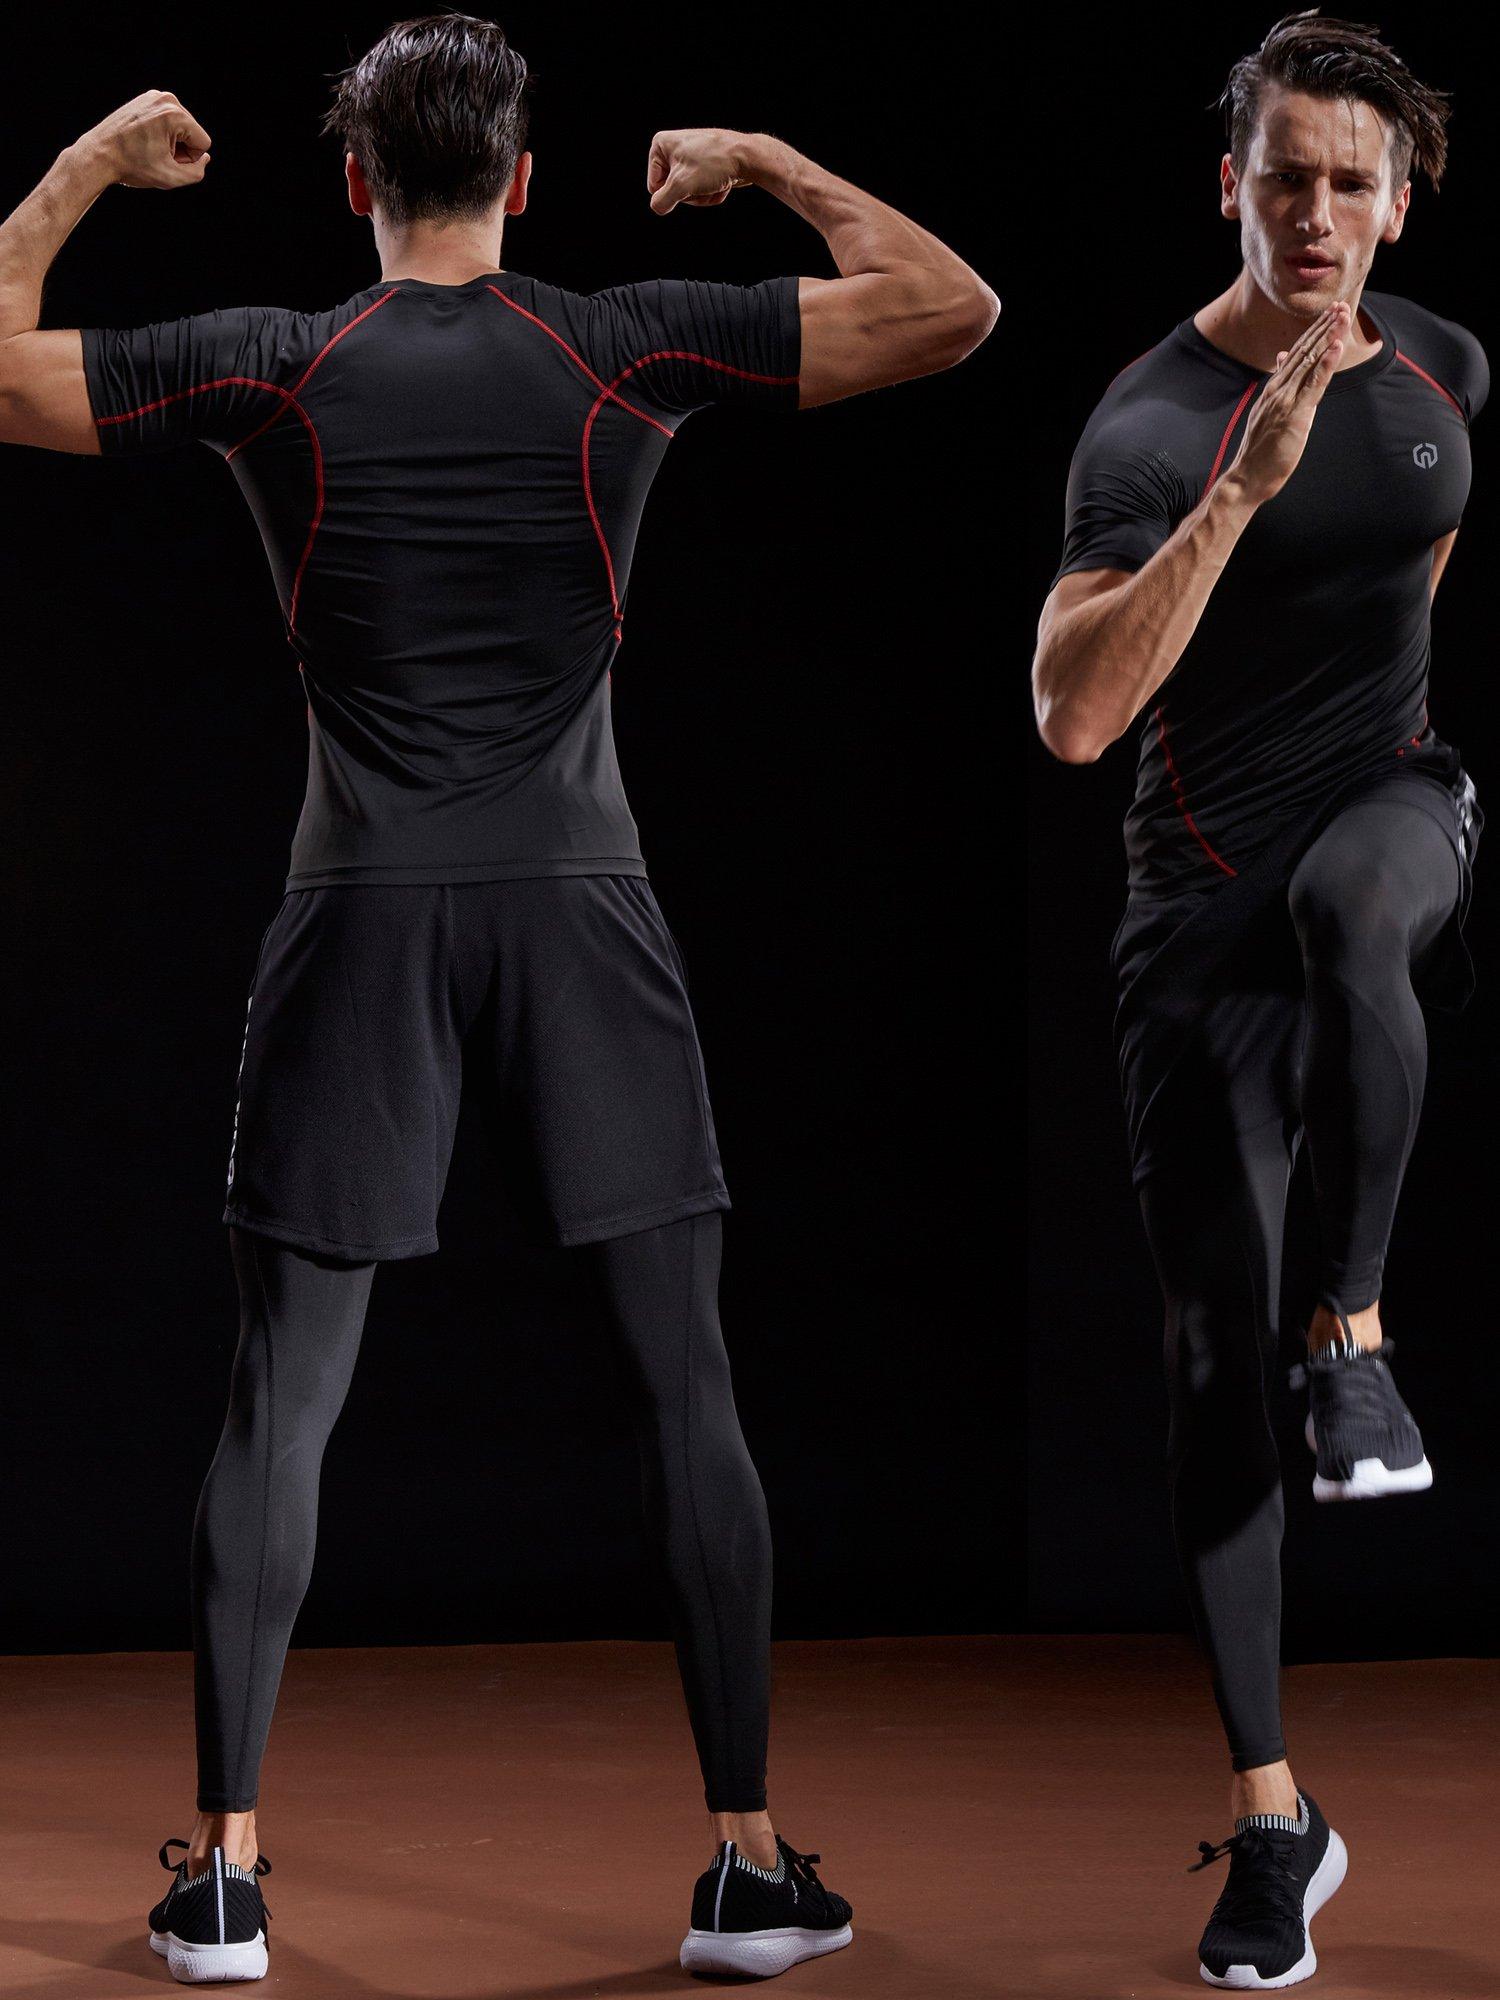 Neleus Men's Compression Baselayer Athletic Workout T Shirts,5022,One Piece,Black(red Striped),US S,EU M by Neleus (Image #3)